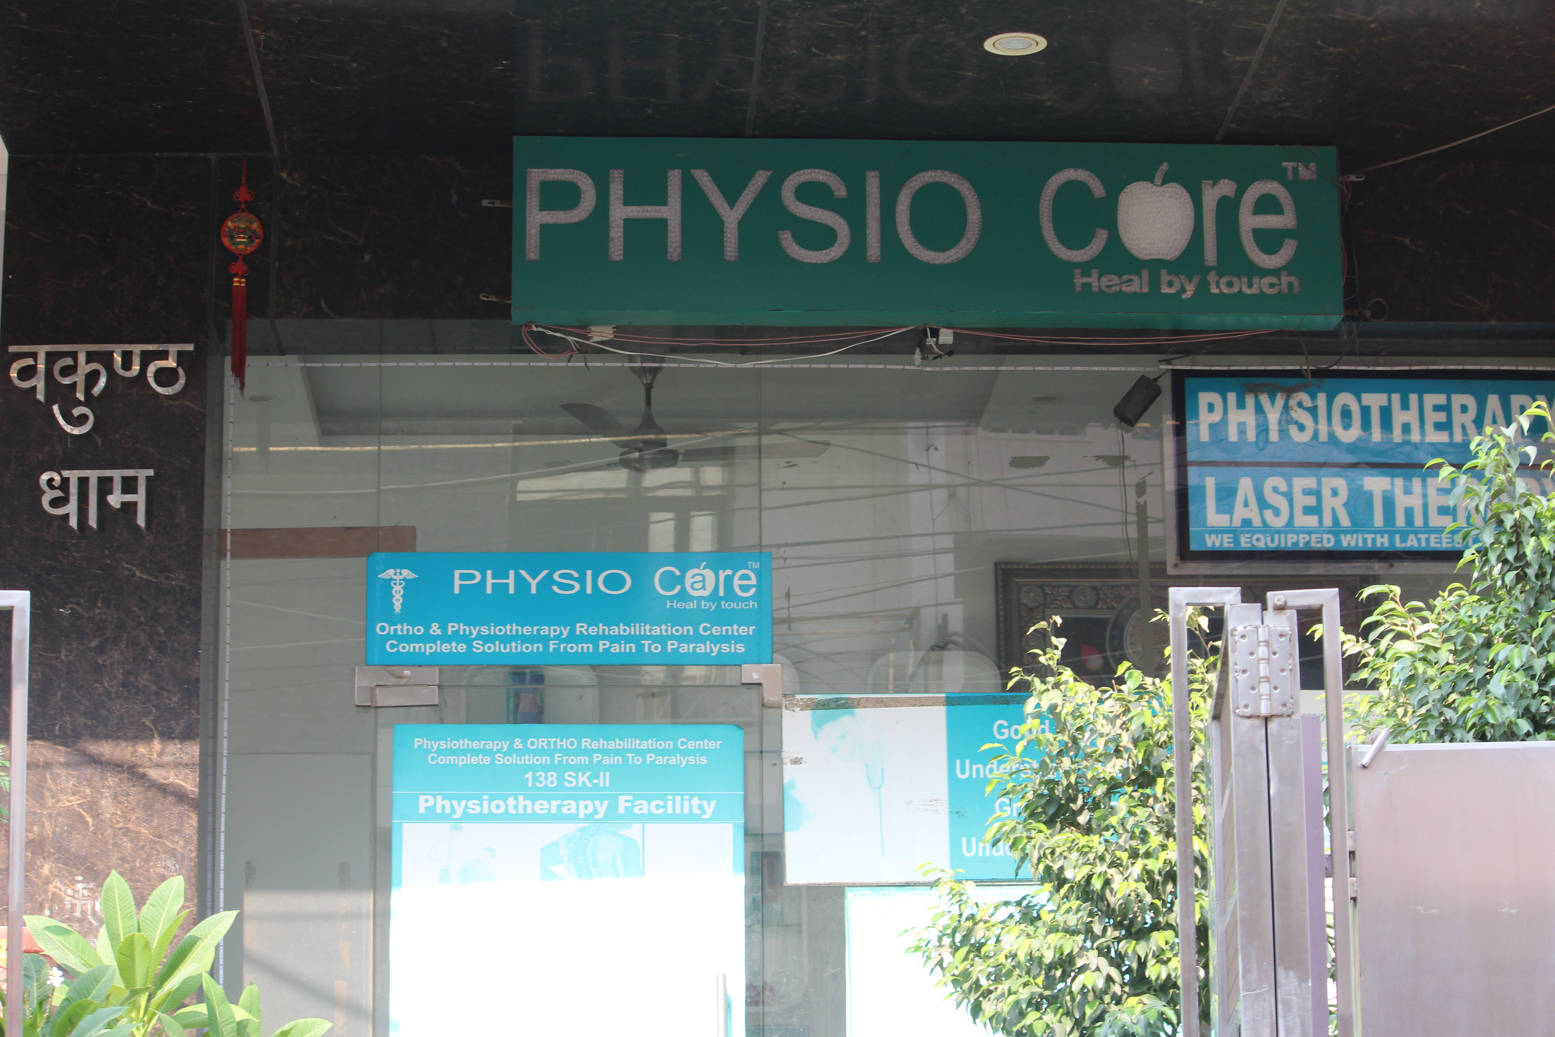 Physio Care - Best Physiotherapy Clinic - Shakti Khand 2 Indirapuram Ghaziabad Noida New Delhi NCR